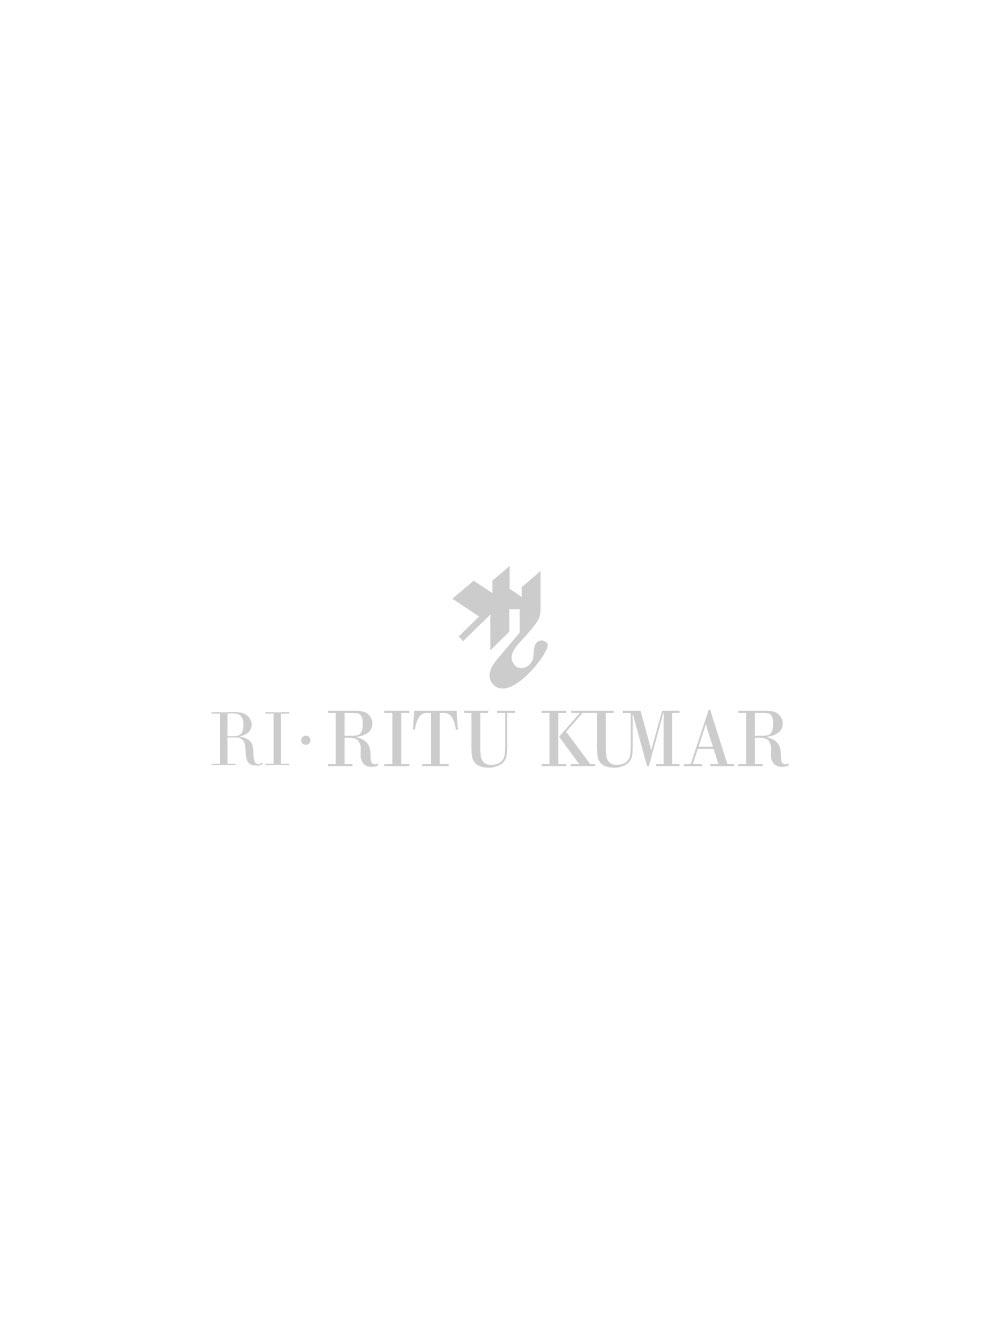 Khaki Green & Beige Aari Saree With Unstitched Blouse